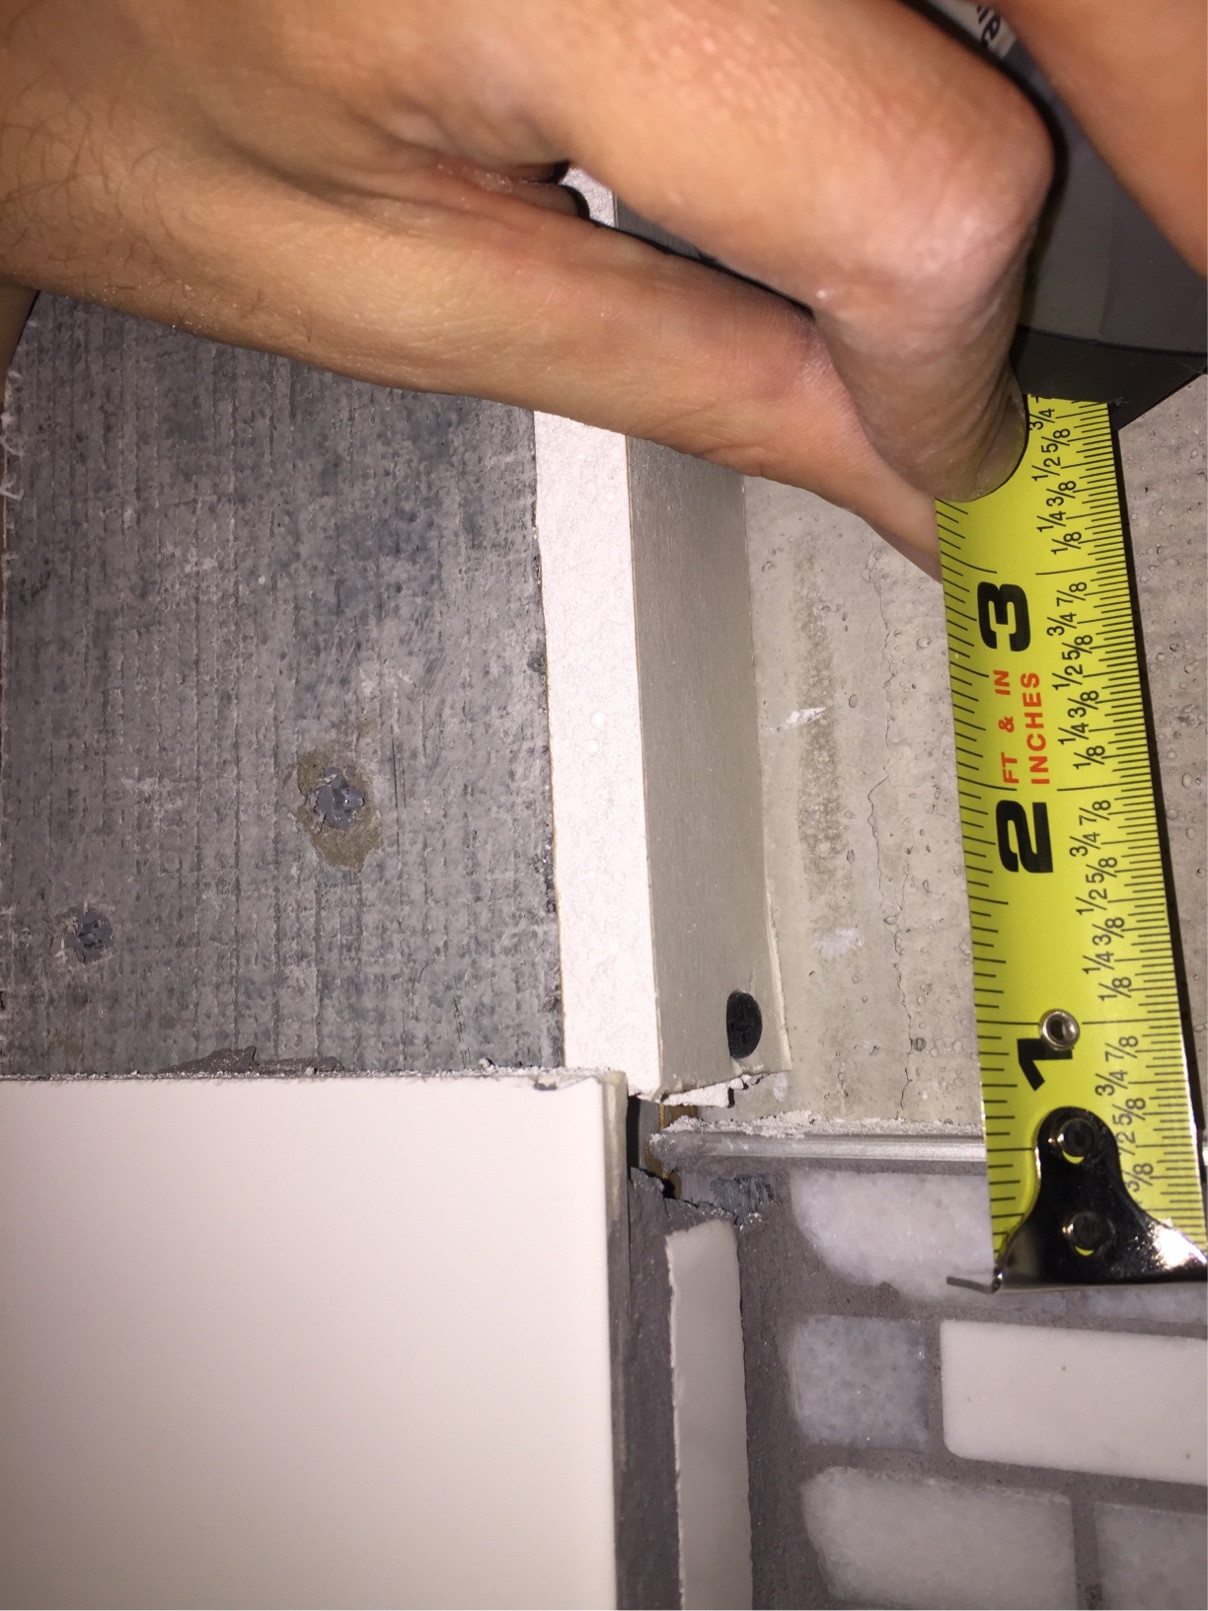 Tiling Shower Filling Gaps Between Tile And Drywall